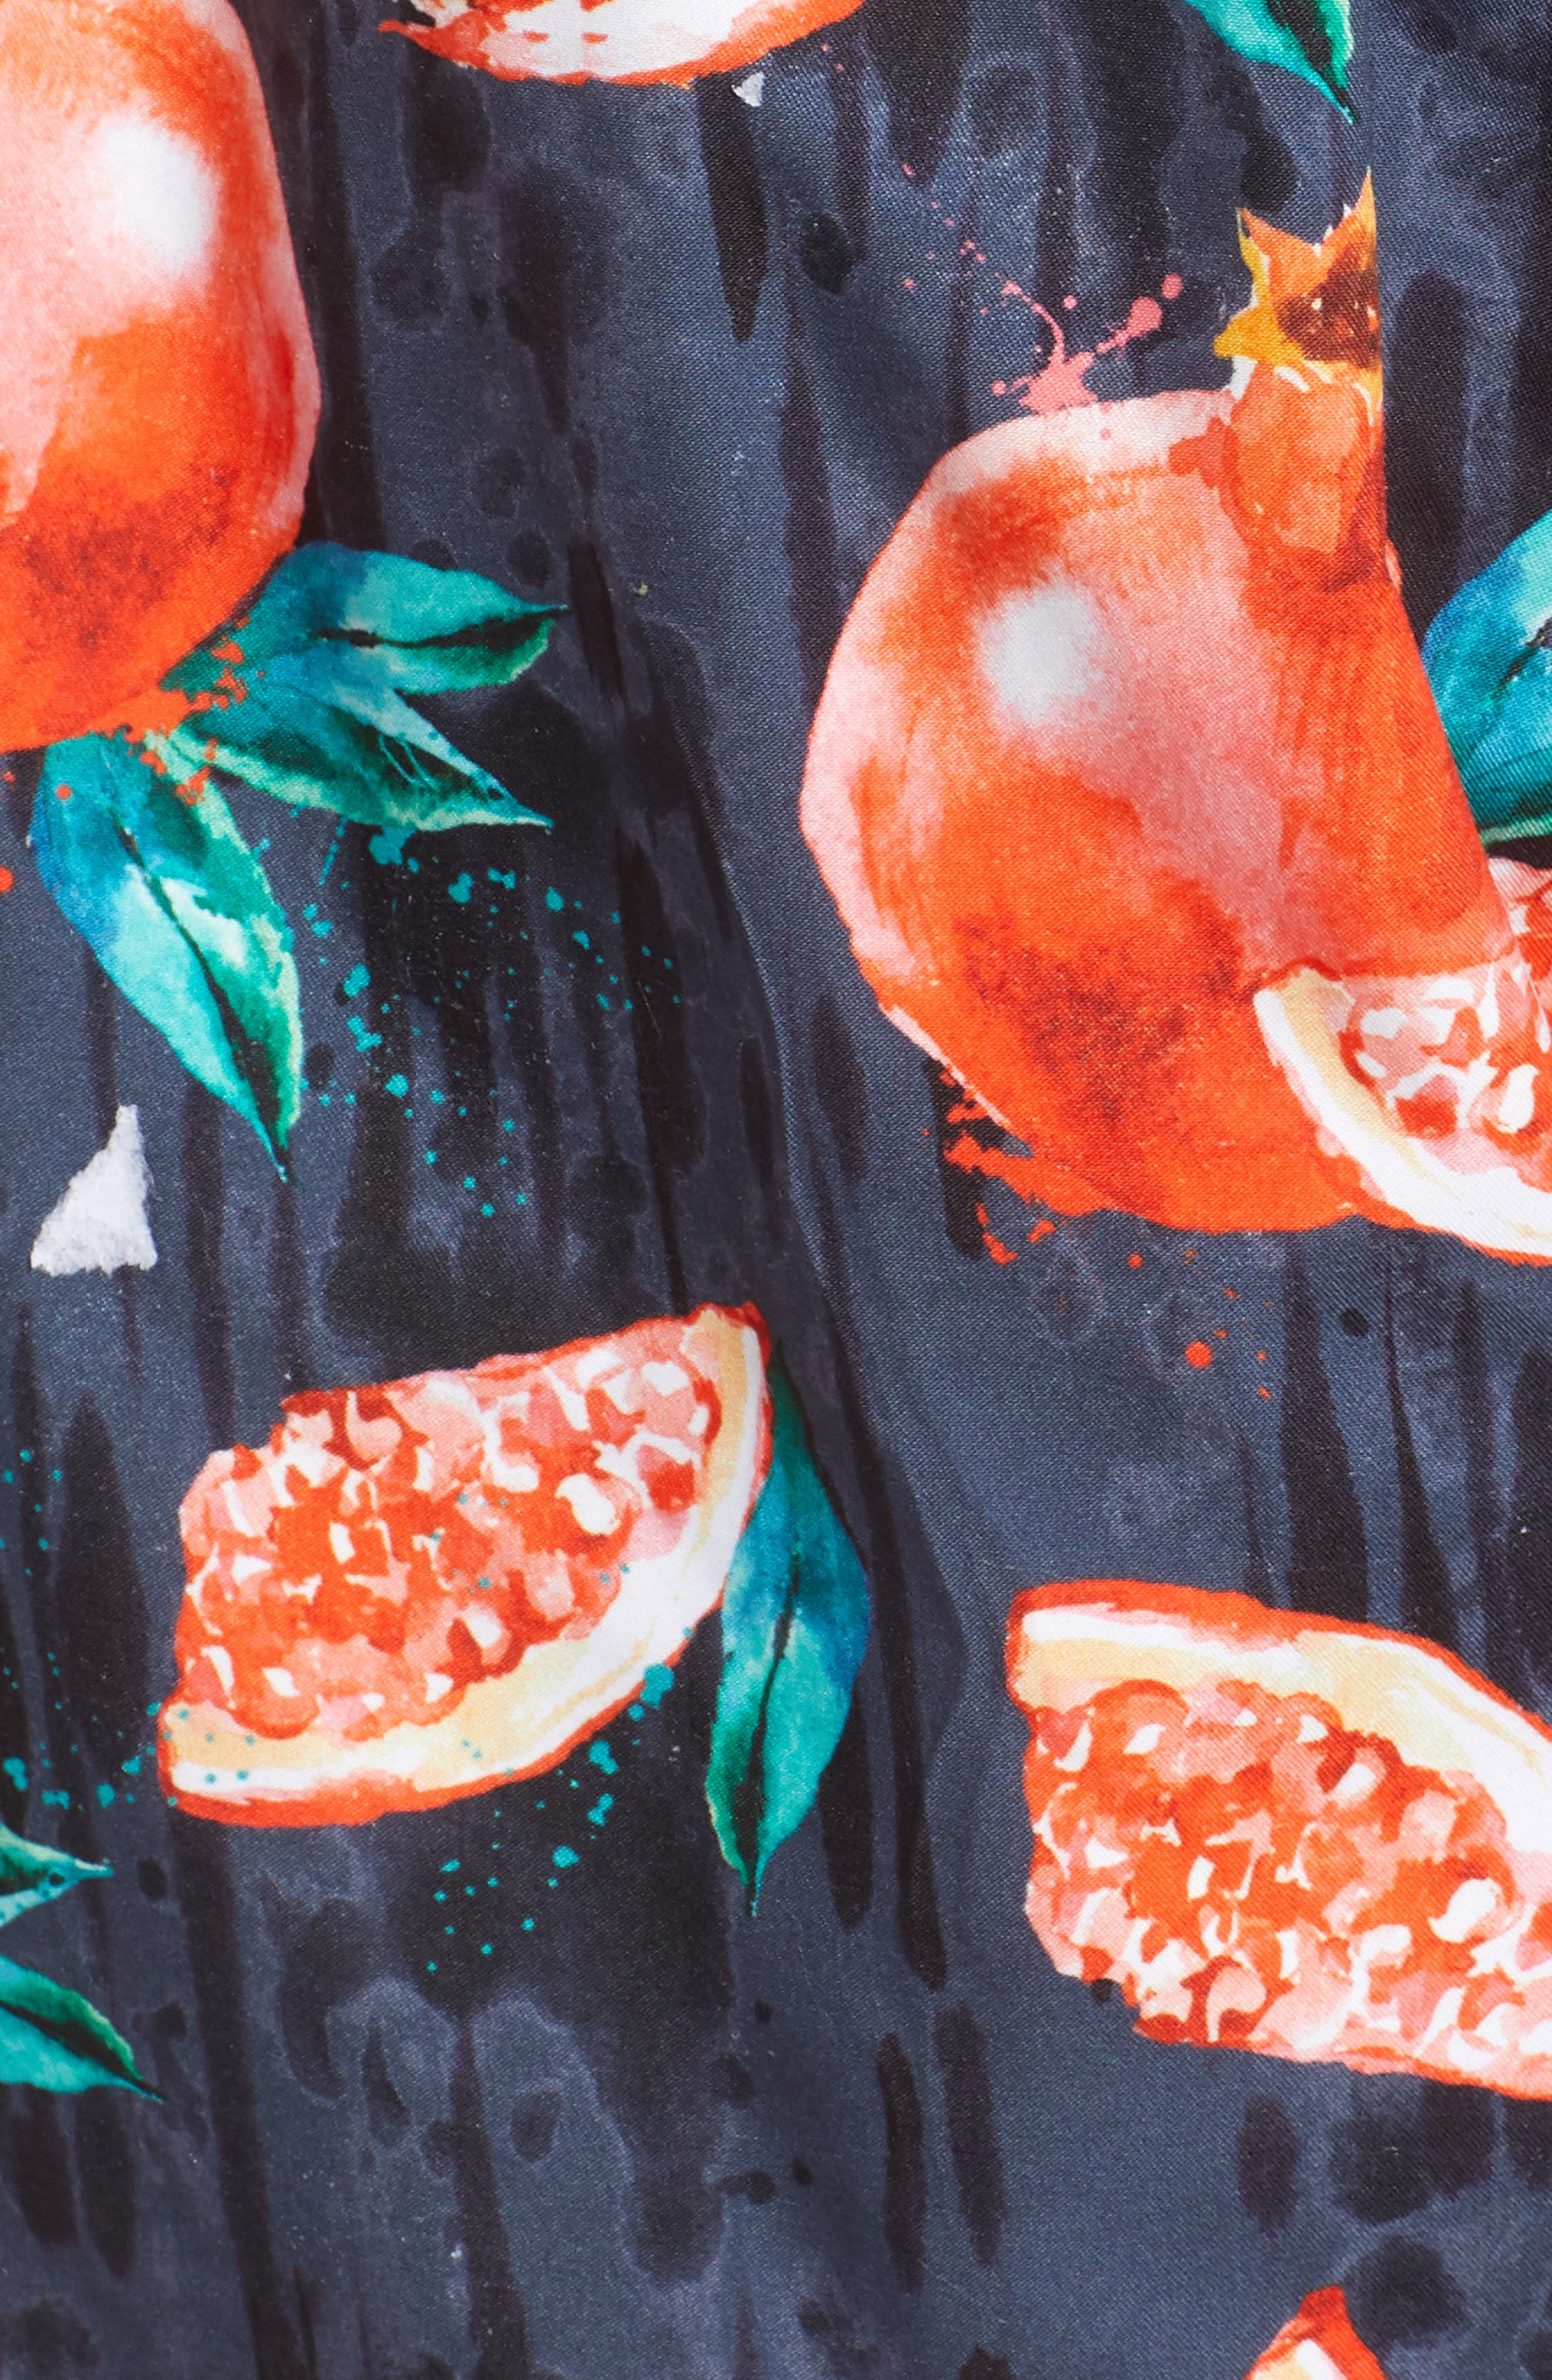 Threadfin Pomegranate Swim Trunks,                             Alternate thumbnail 5, color,                             Grey